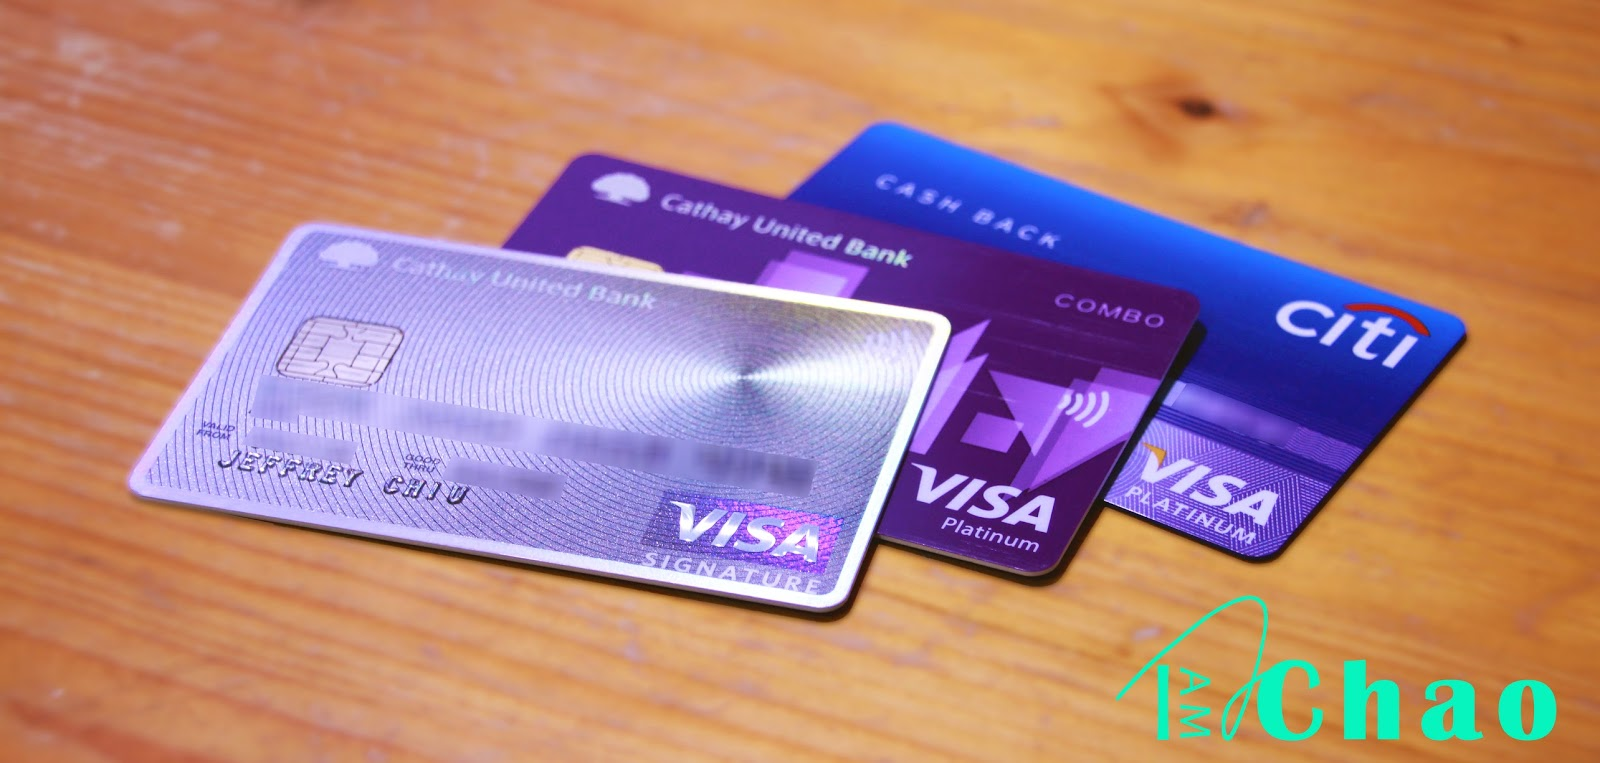 I am Jeffrey Chao: 國外刷卡要PIN碼? 沒問題!